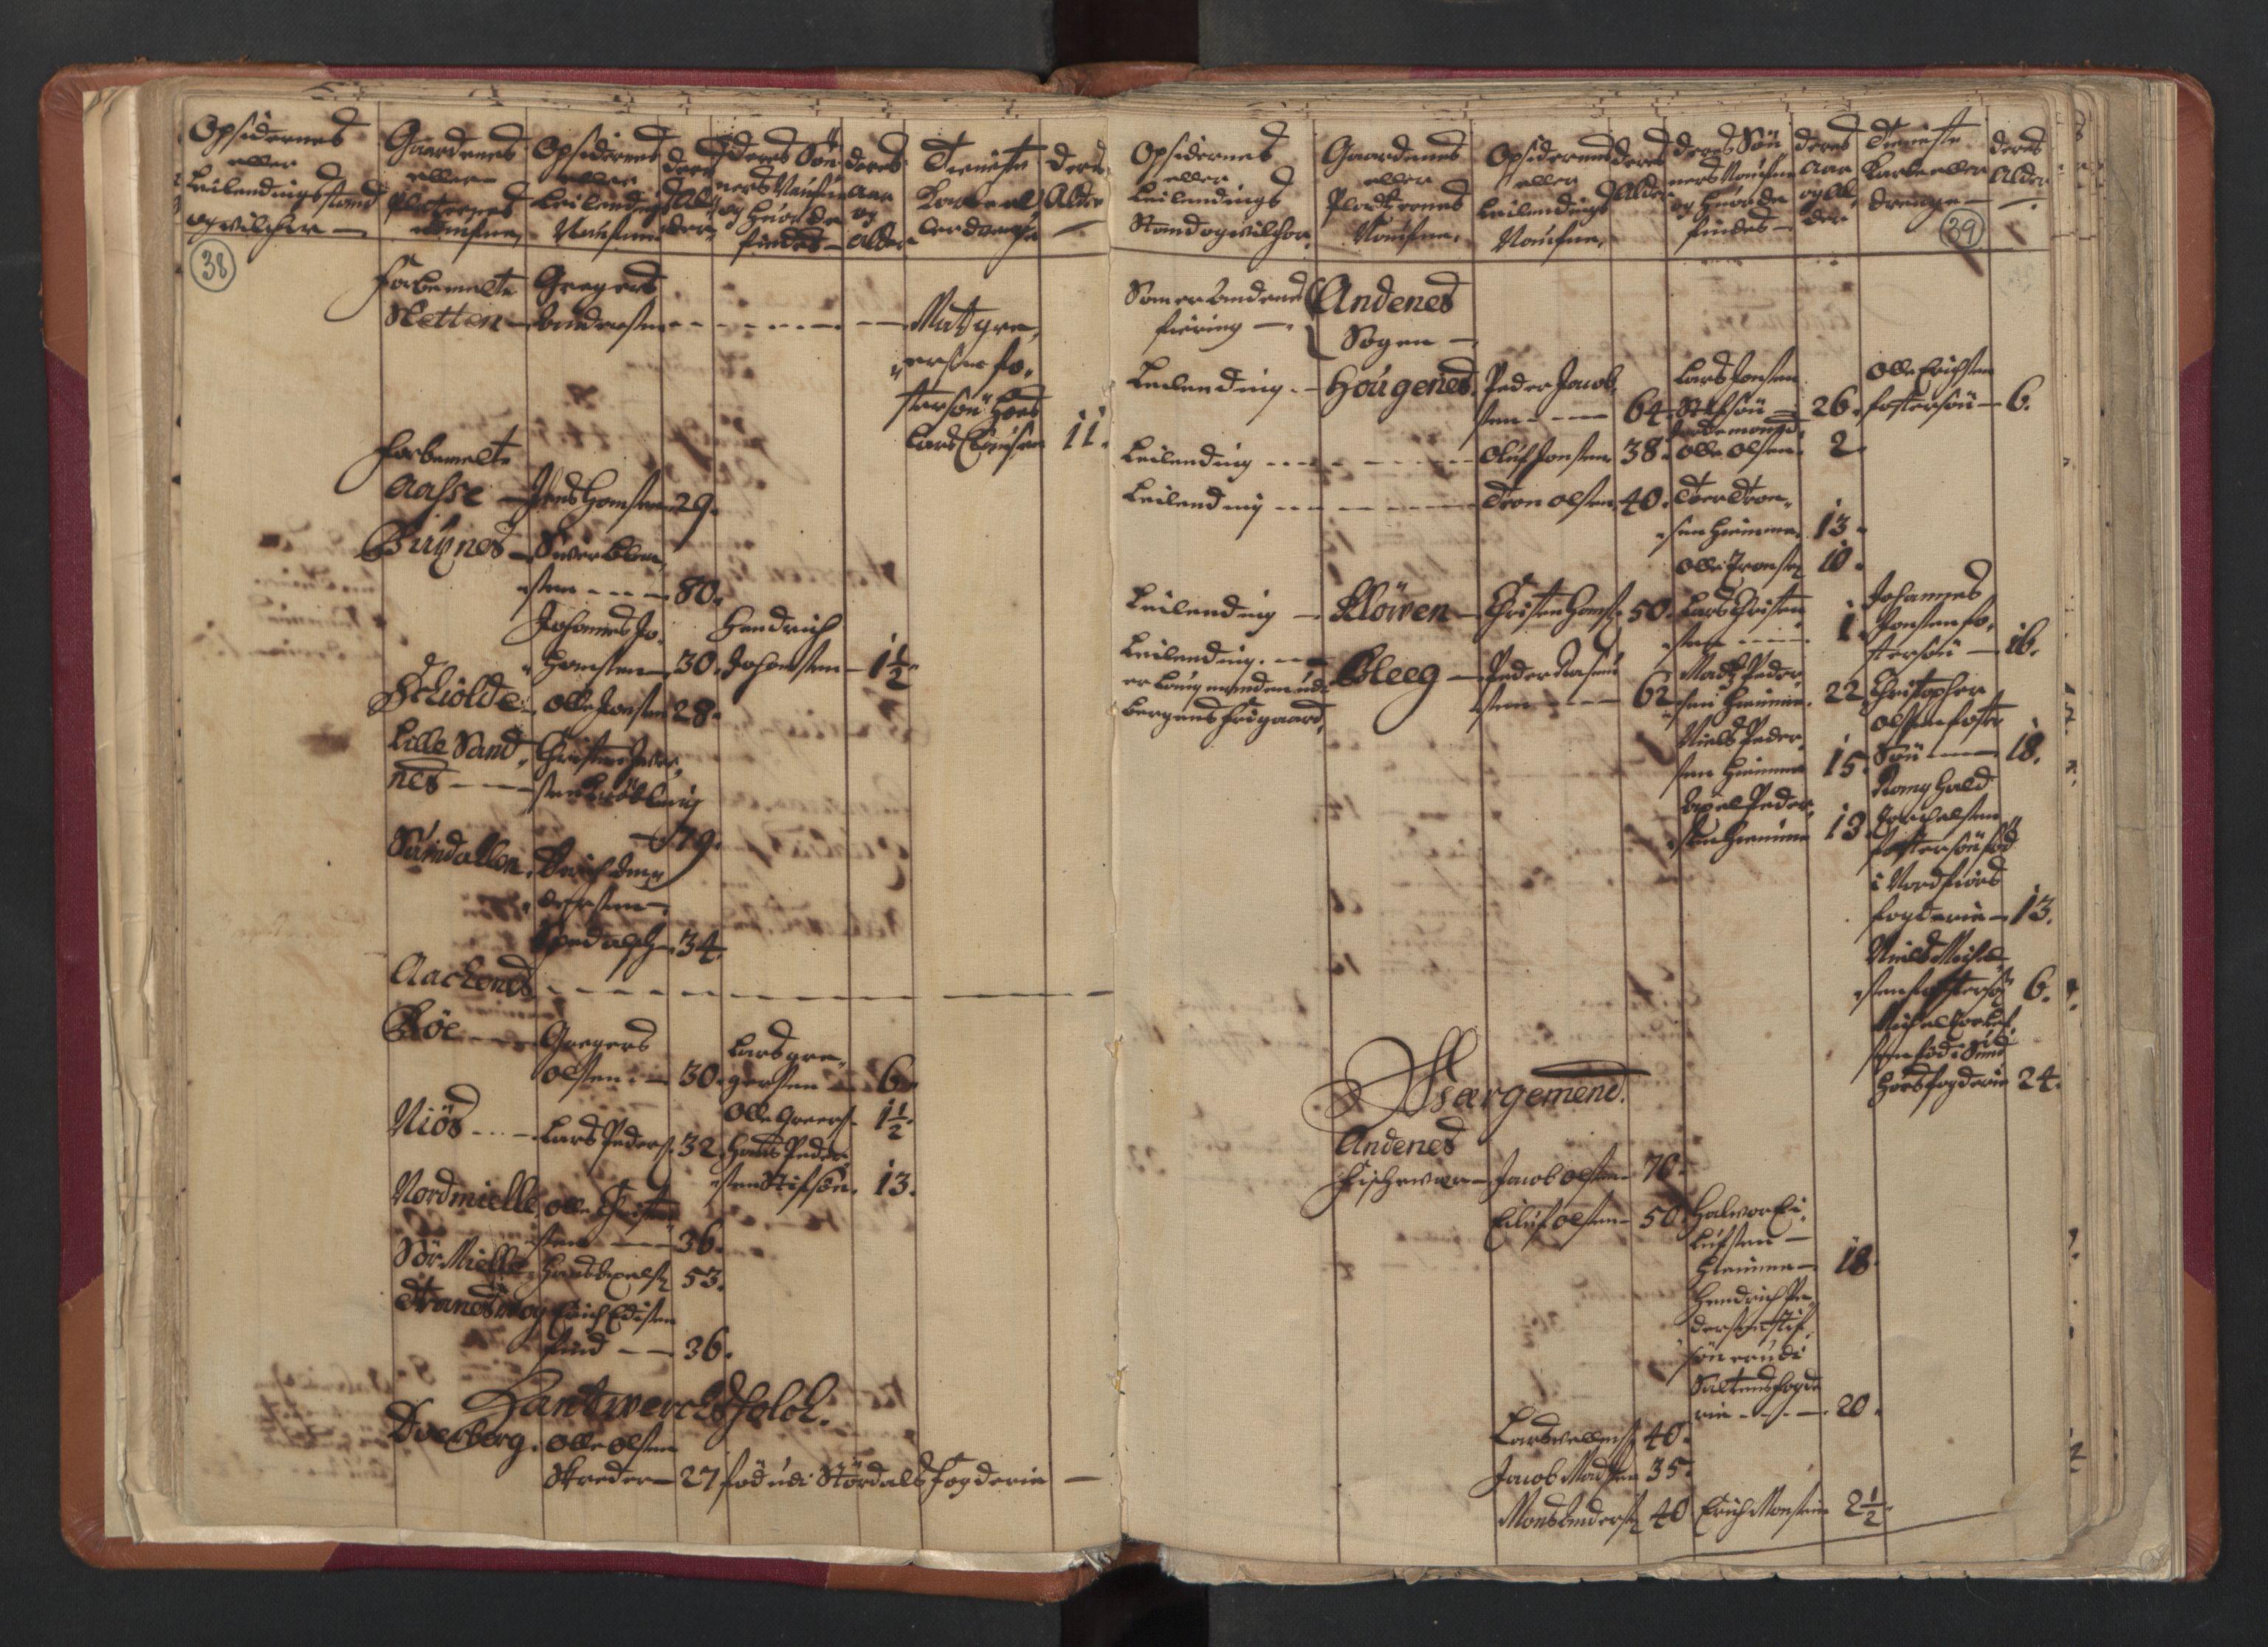 RA, Manntallet 1701, nr. 18: Vesterålen, Andenes og Lofoten fogderi, 1701, s. 38-39